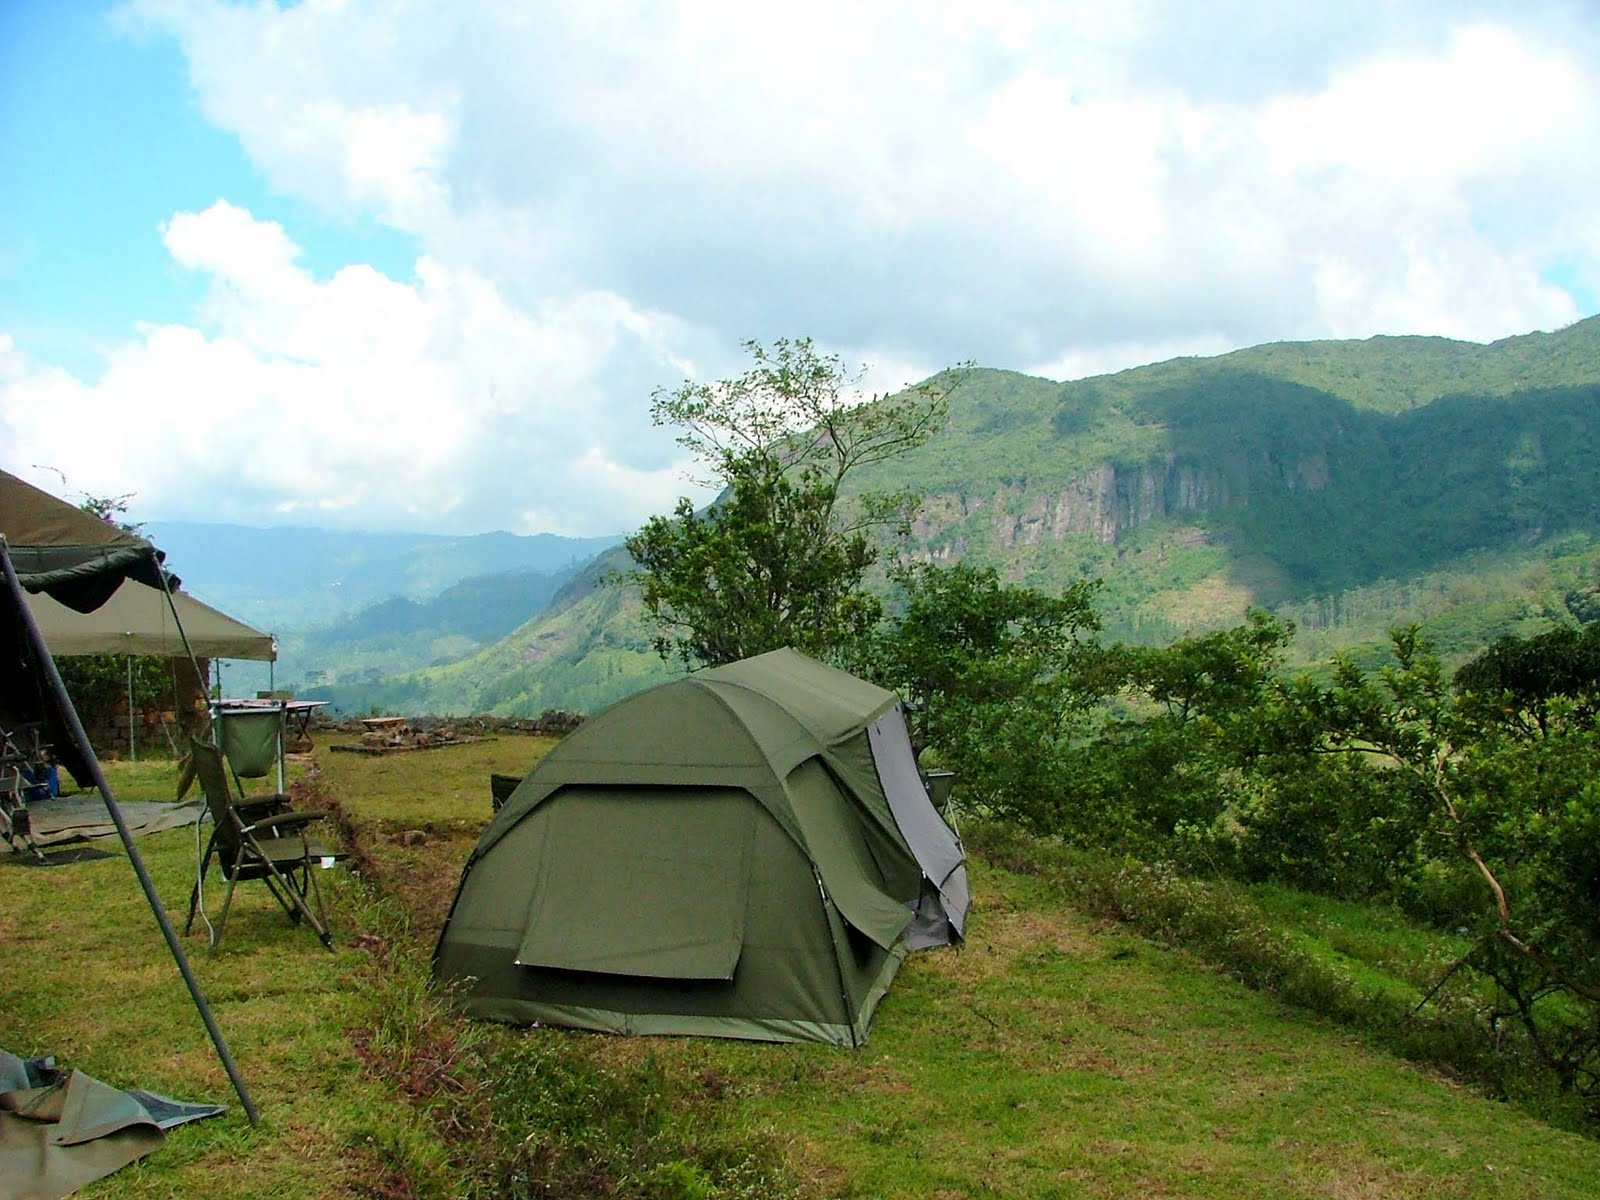 Visit Sri Lanka නරඹමු ශ්රී ලංකා: Meemure – Experience the ...